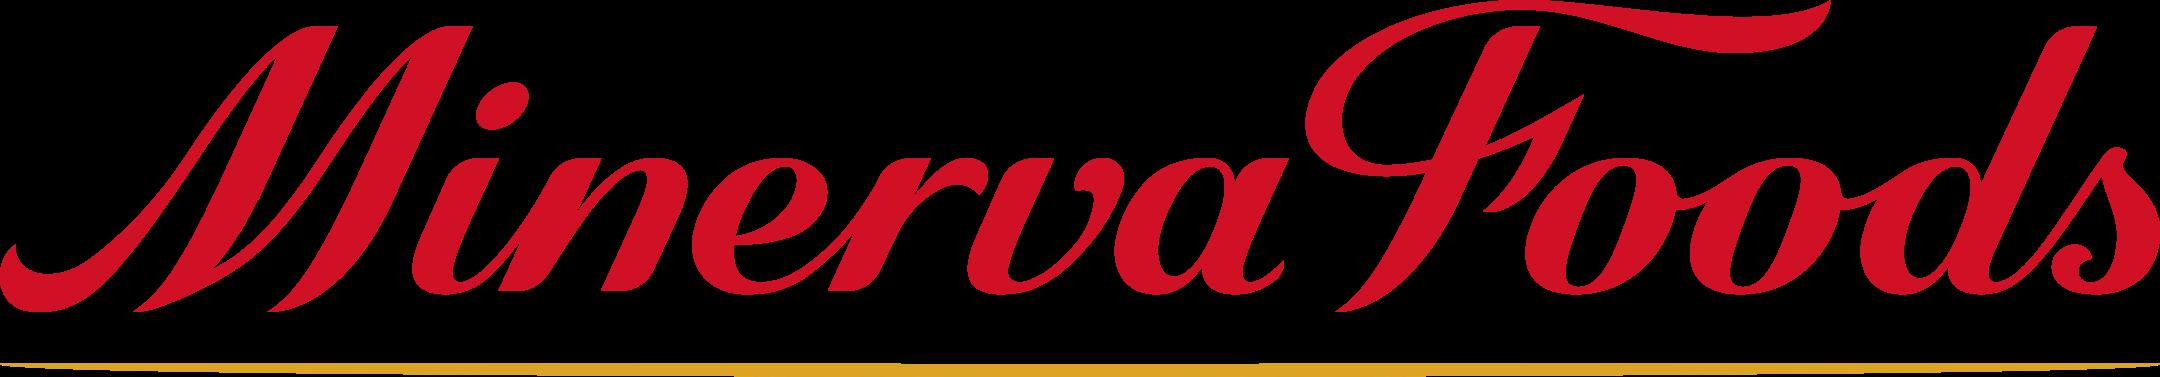 minerva foods logo 1 - Minerva Foods Logo